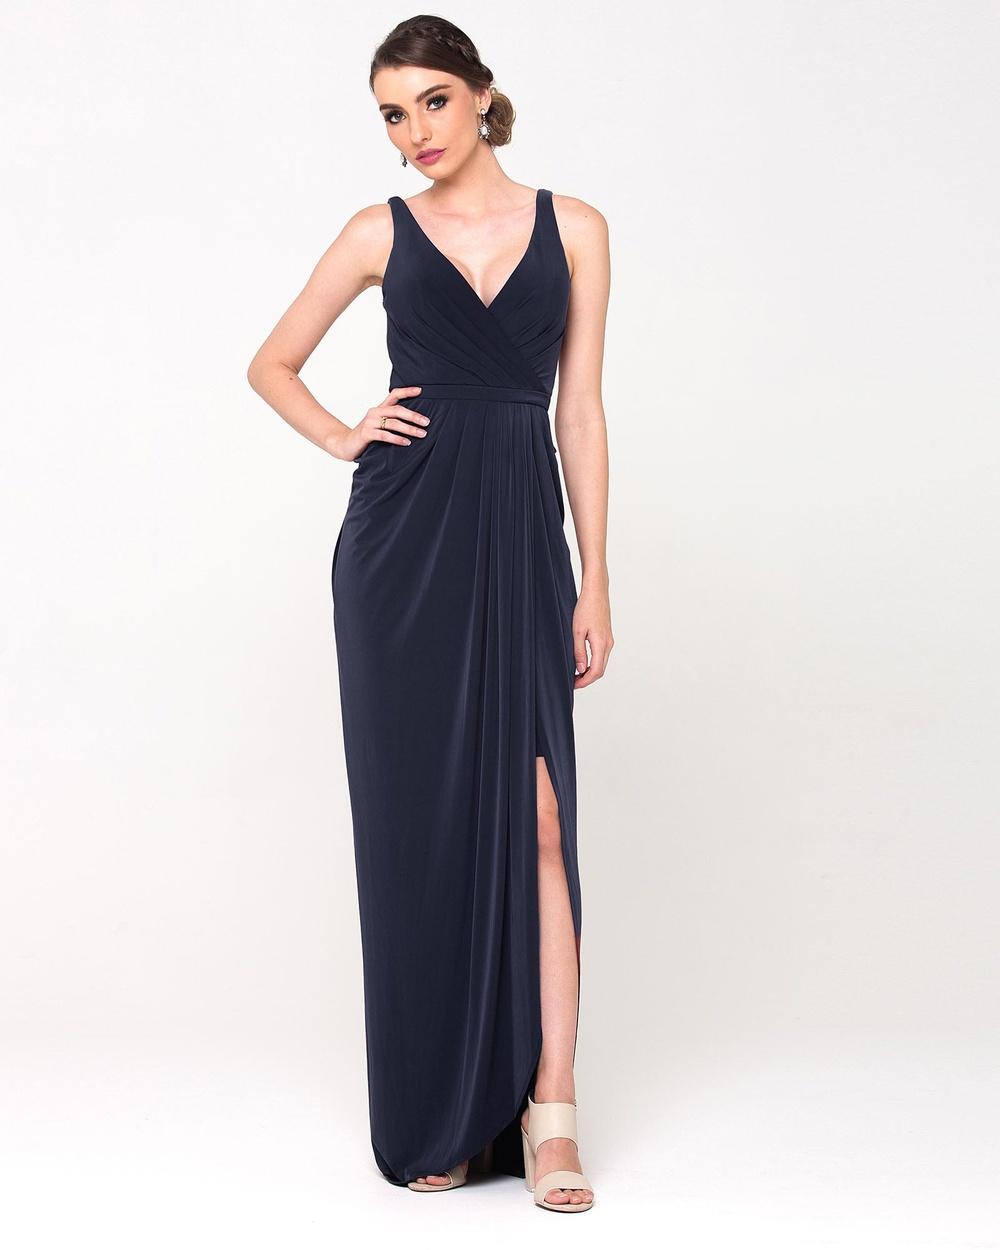 Tania Olsen Designs Bianca Dress Bridesmaid Dresses Navy Bianca Dress